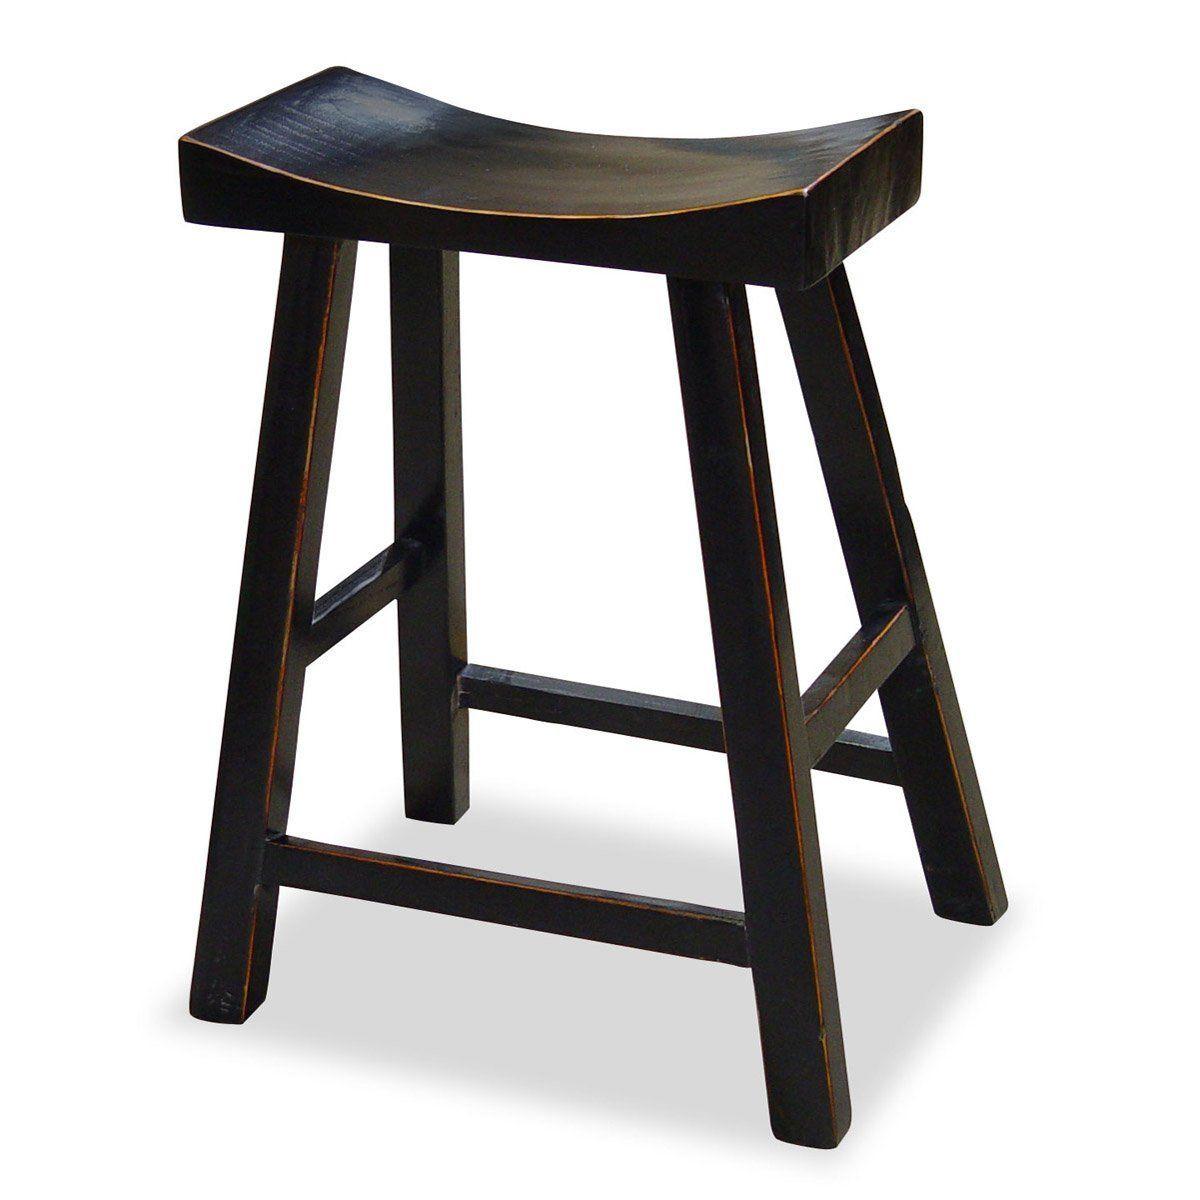 Amazon Com Asian Zen Bar Stool Black Barstools Without Backs Bar Stools Home Bar Furniture Stool